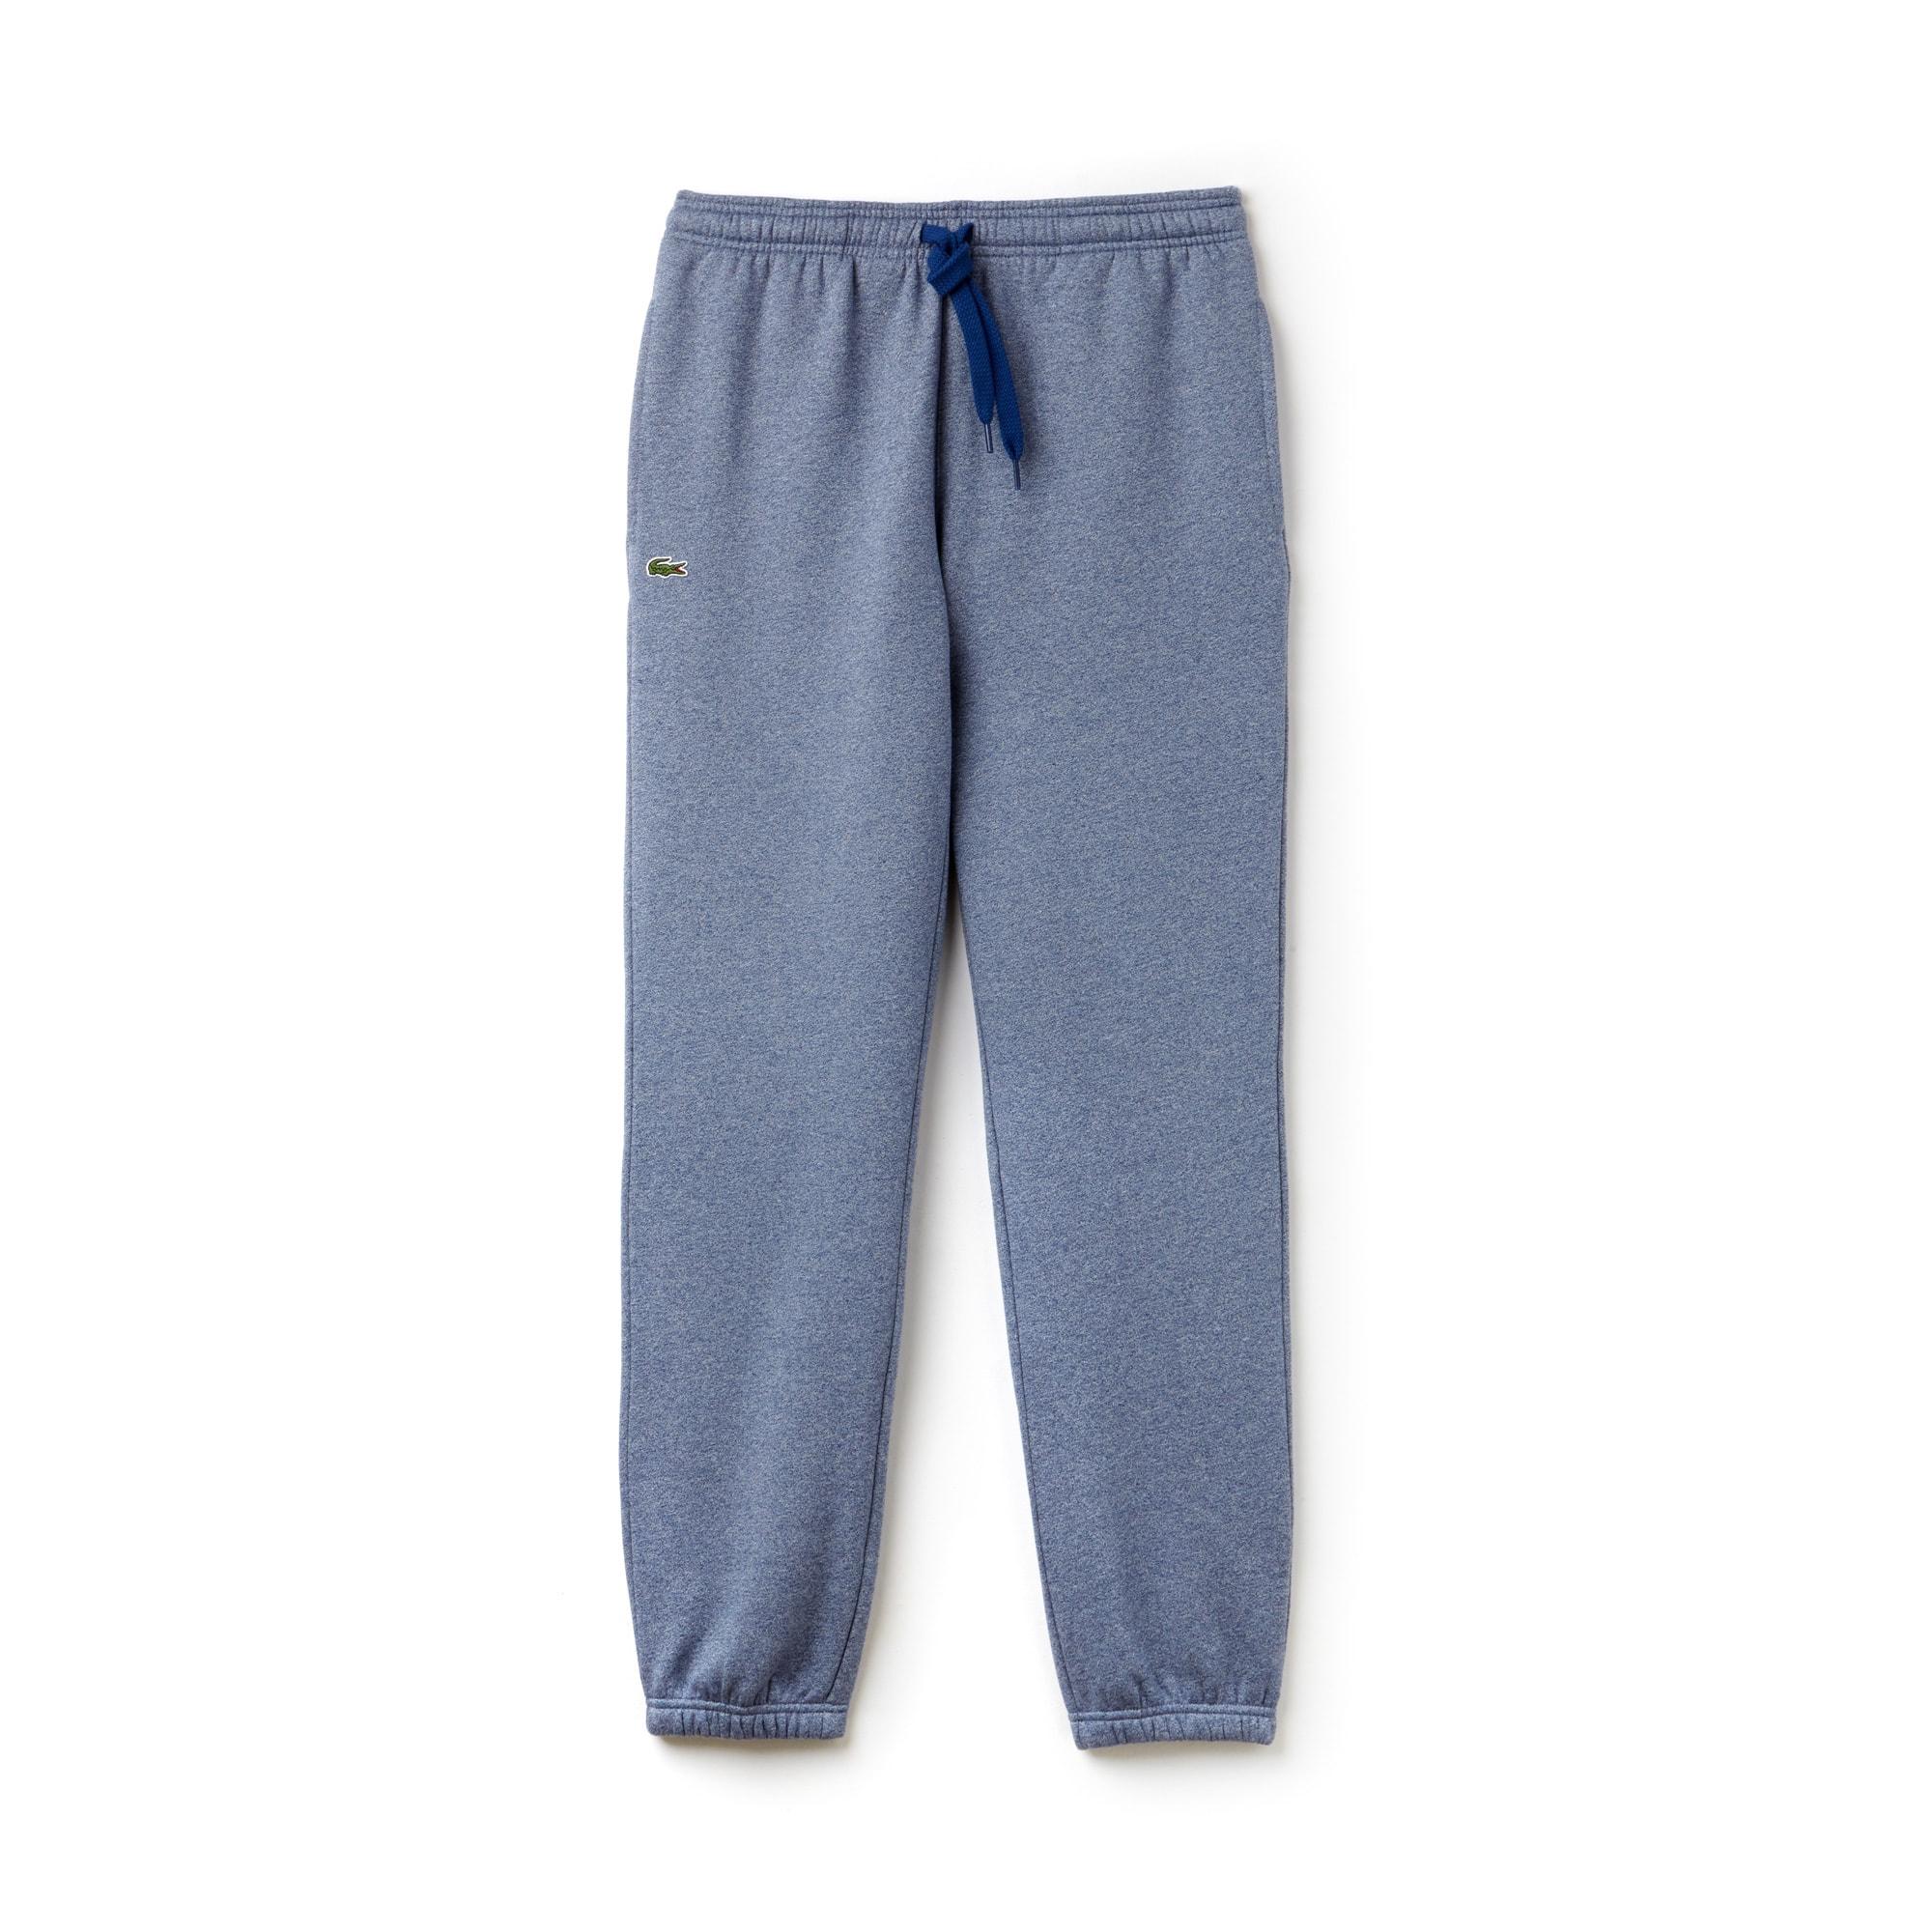 Men's Lacoste SPORT Tennis trackpants in fleece